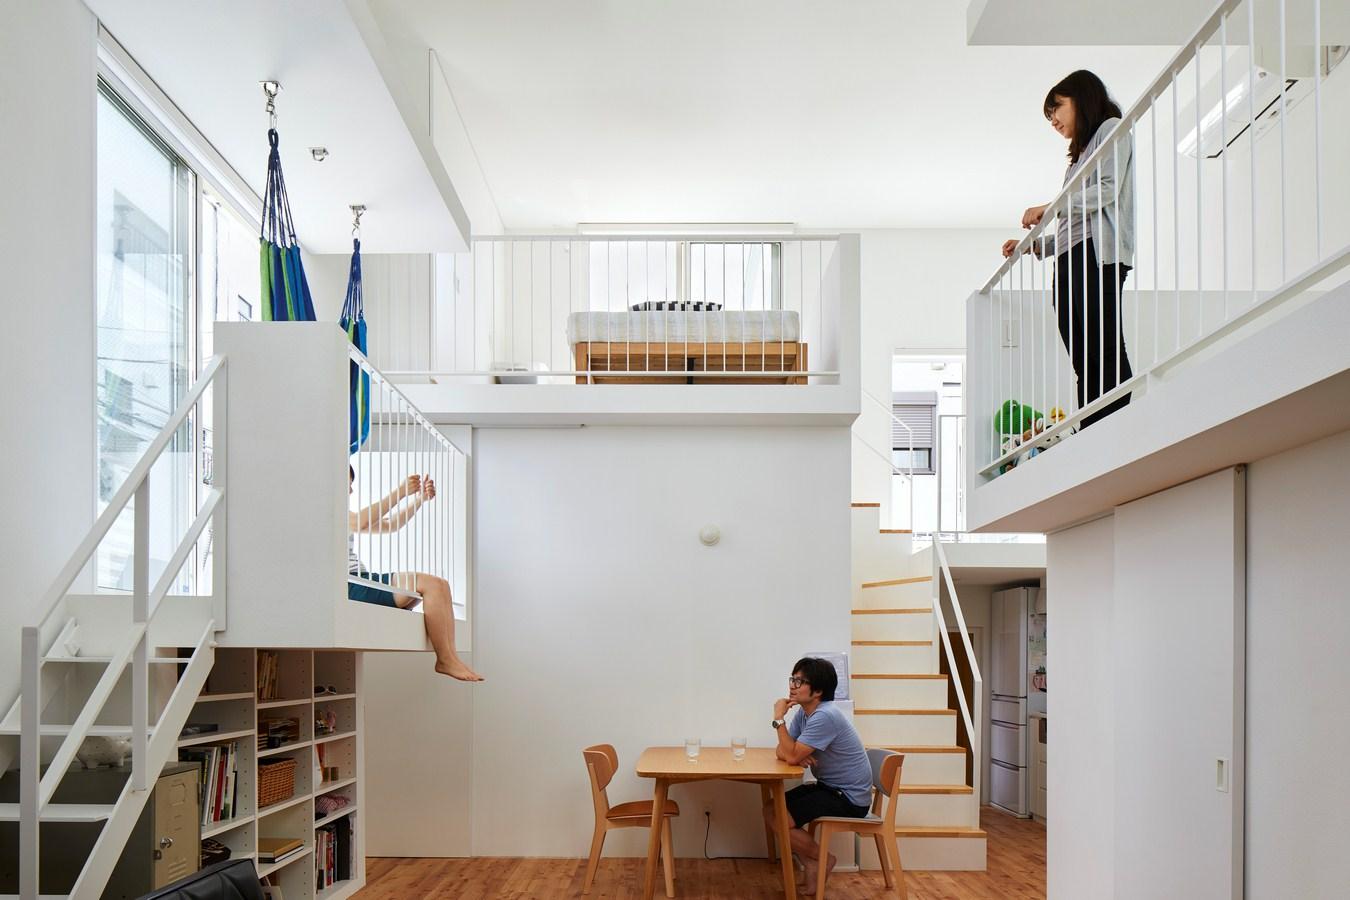 BALCONY HOUSE By Takeshi Hosaka architects - Sheet23